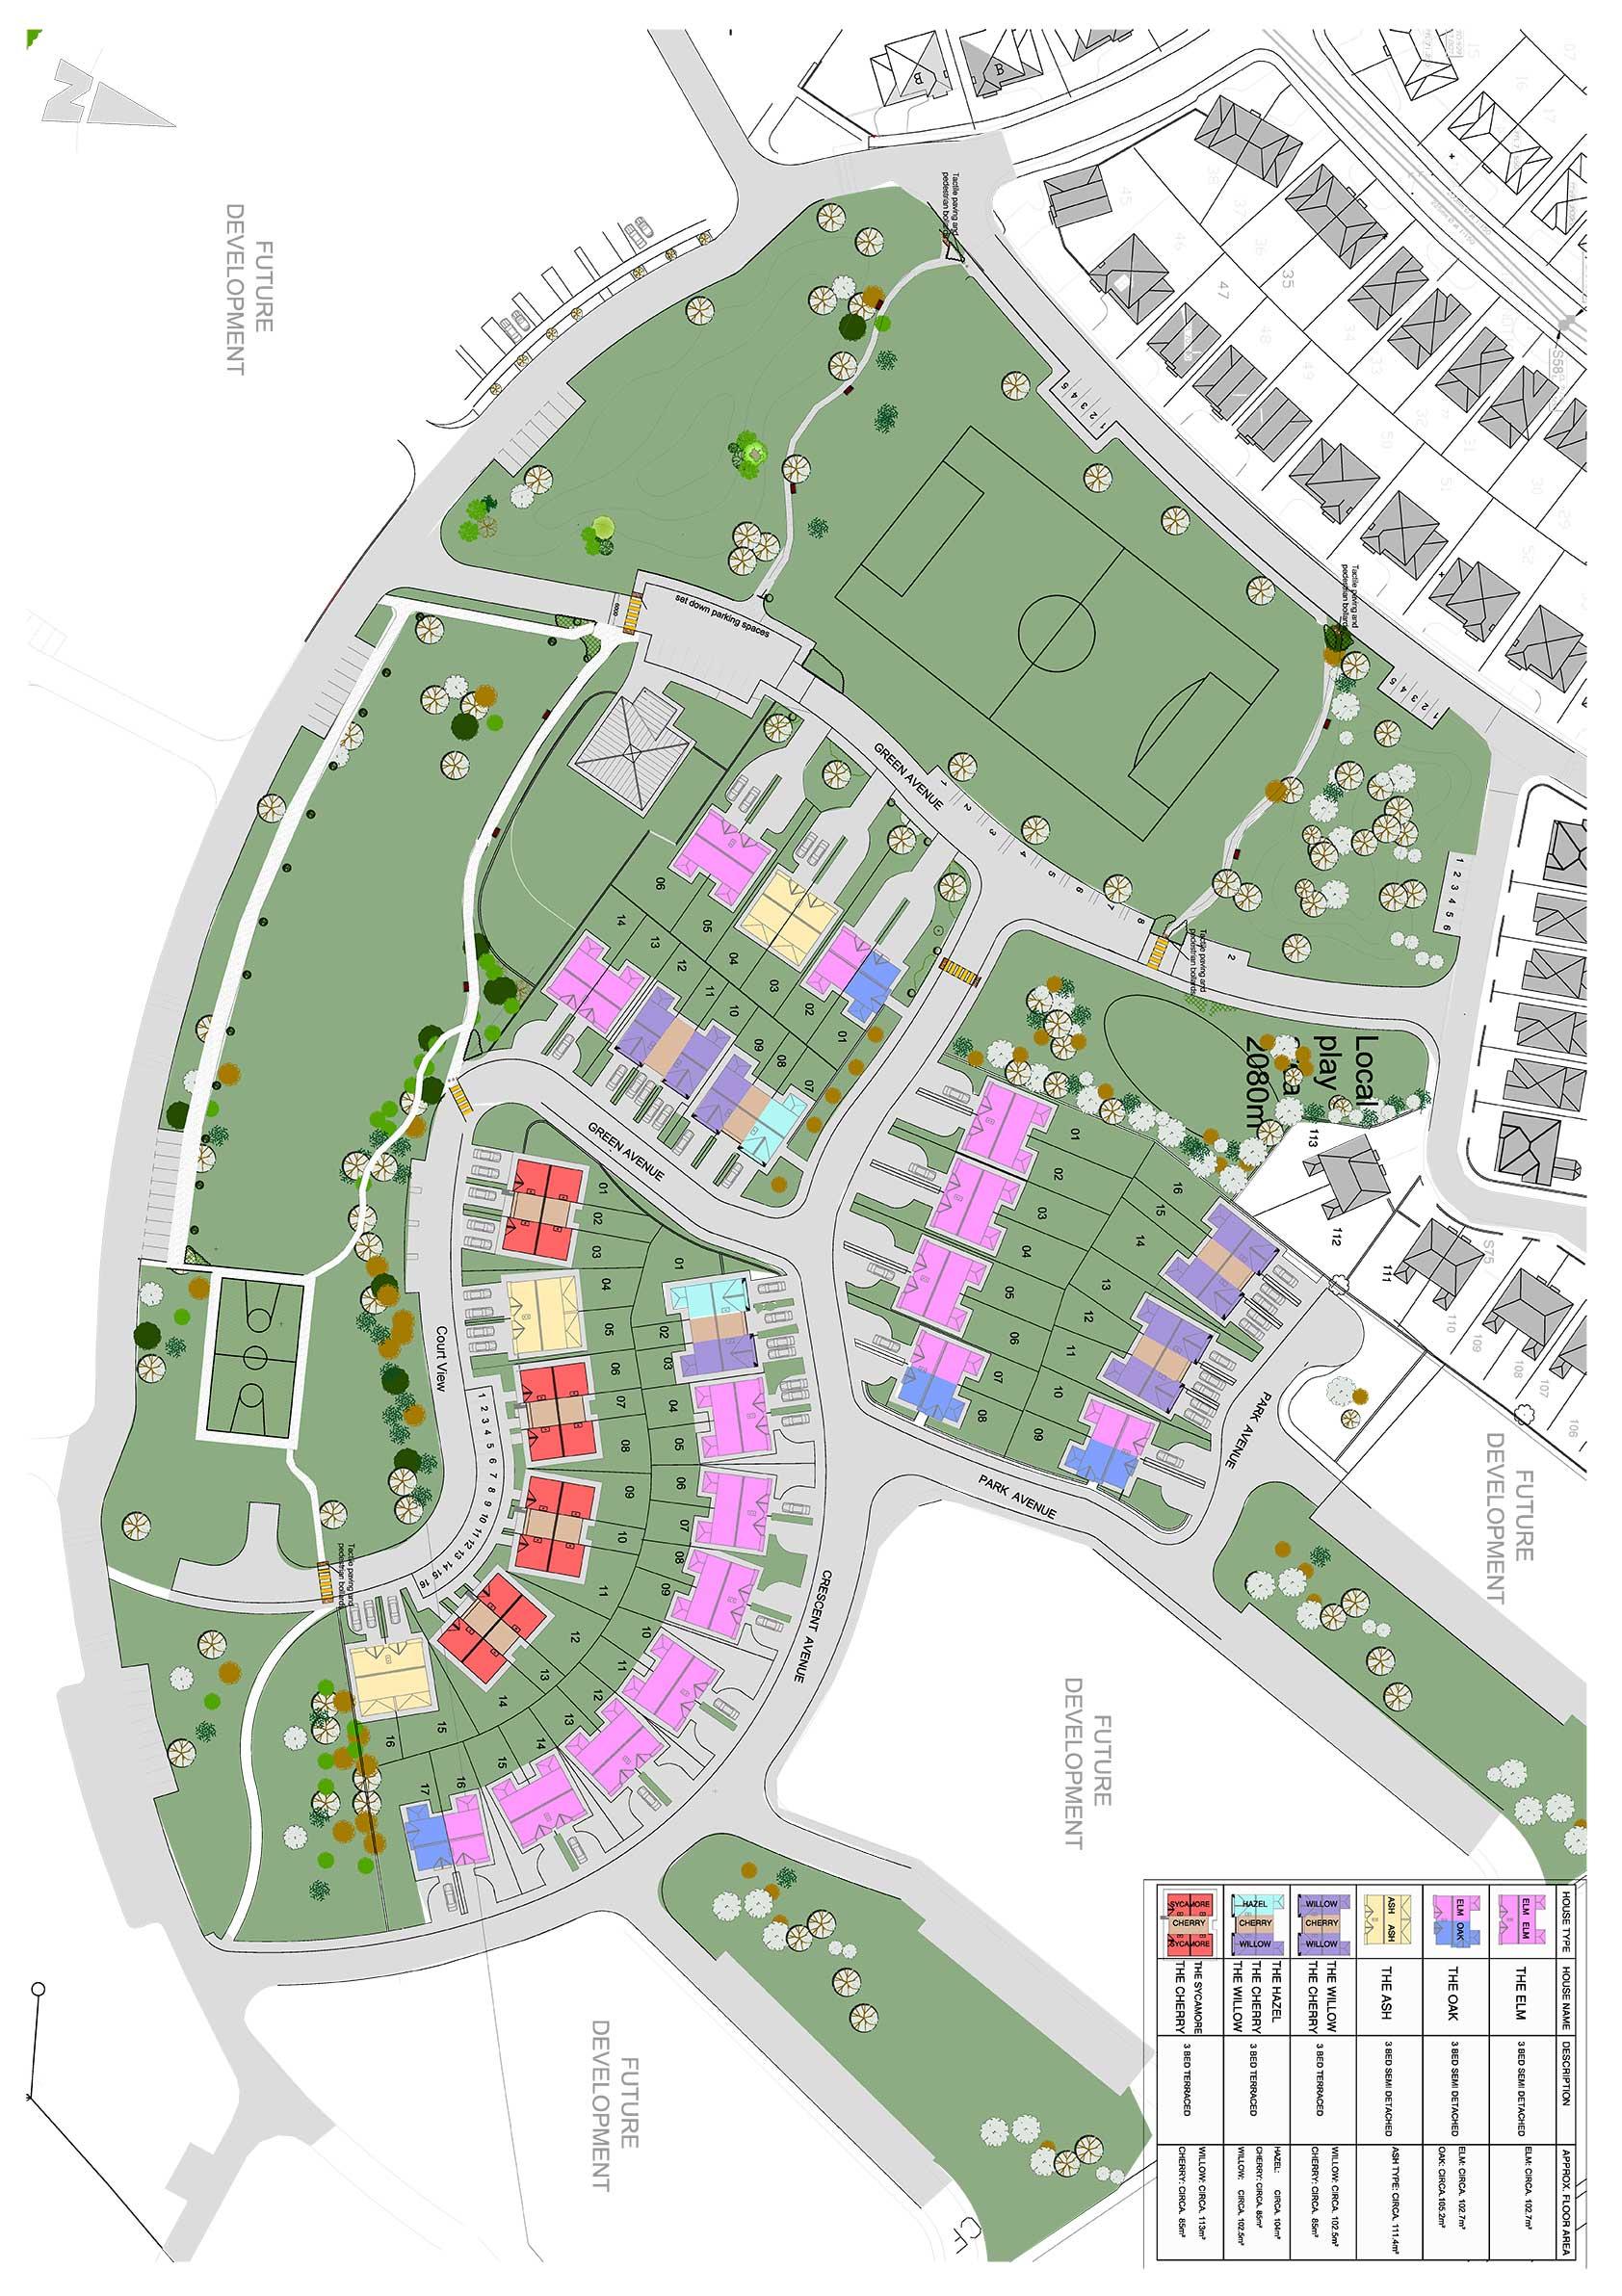 Friary Walk Site Plan